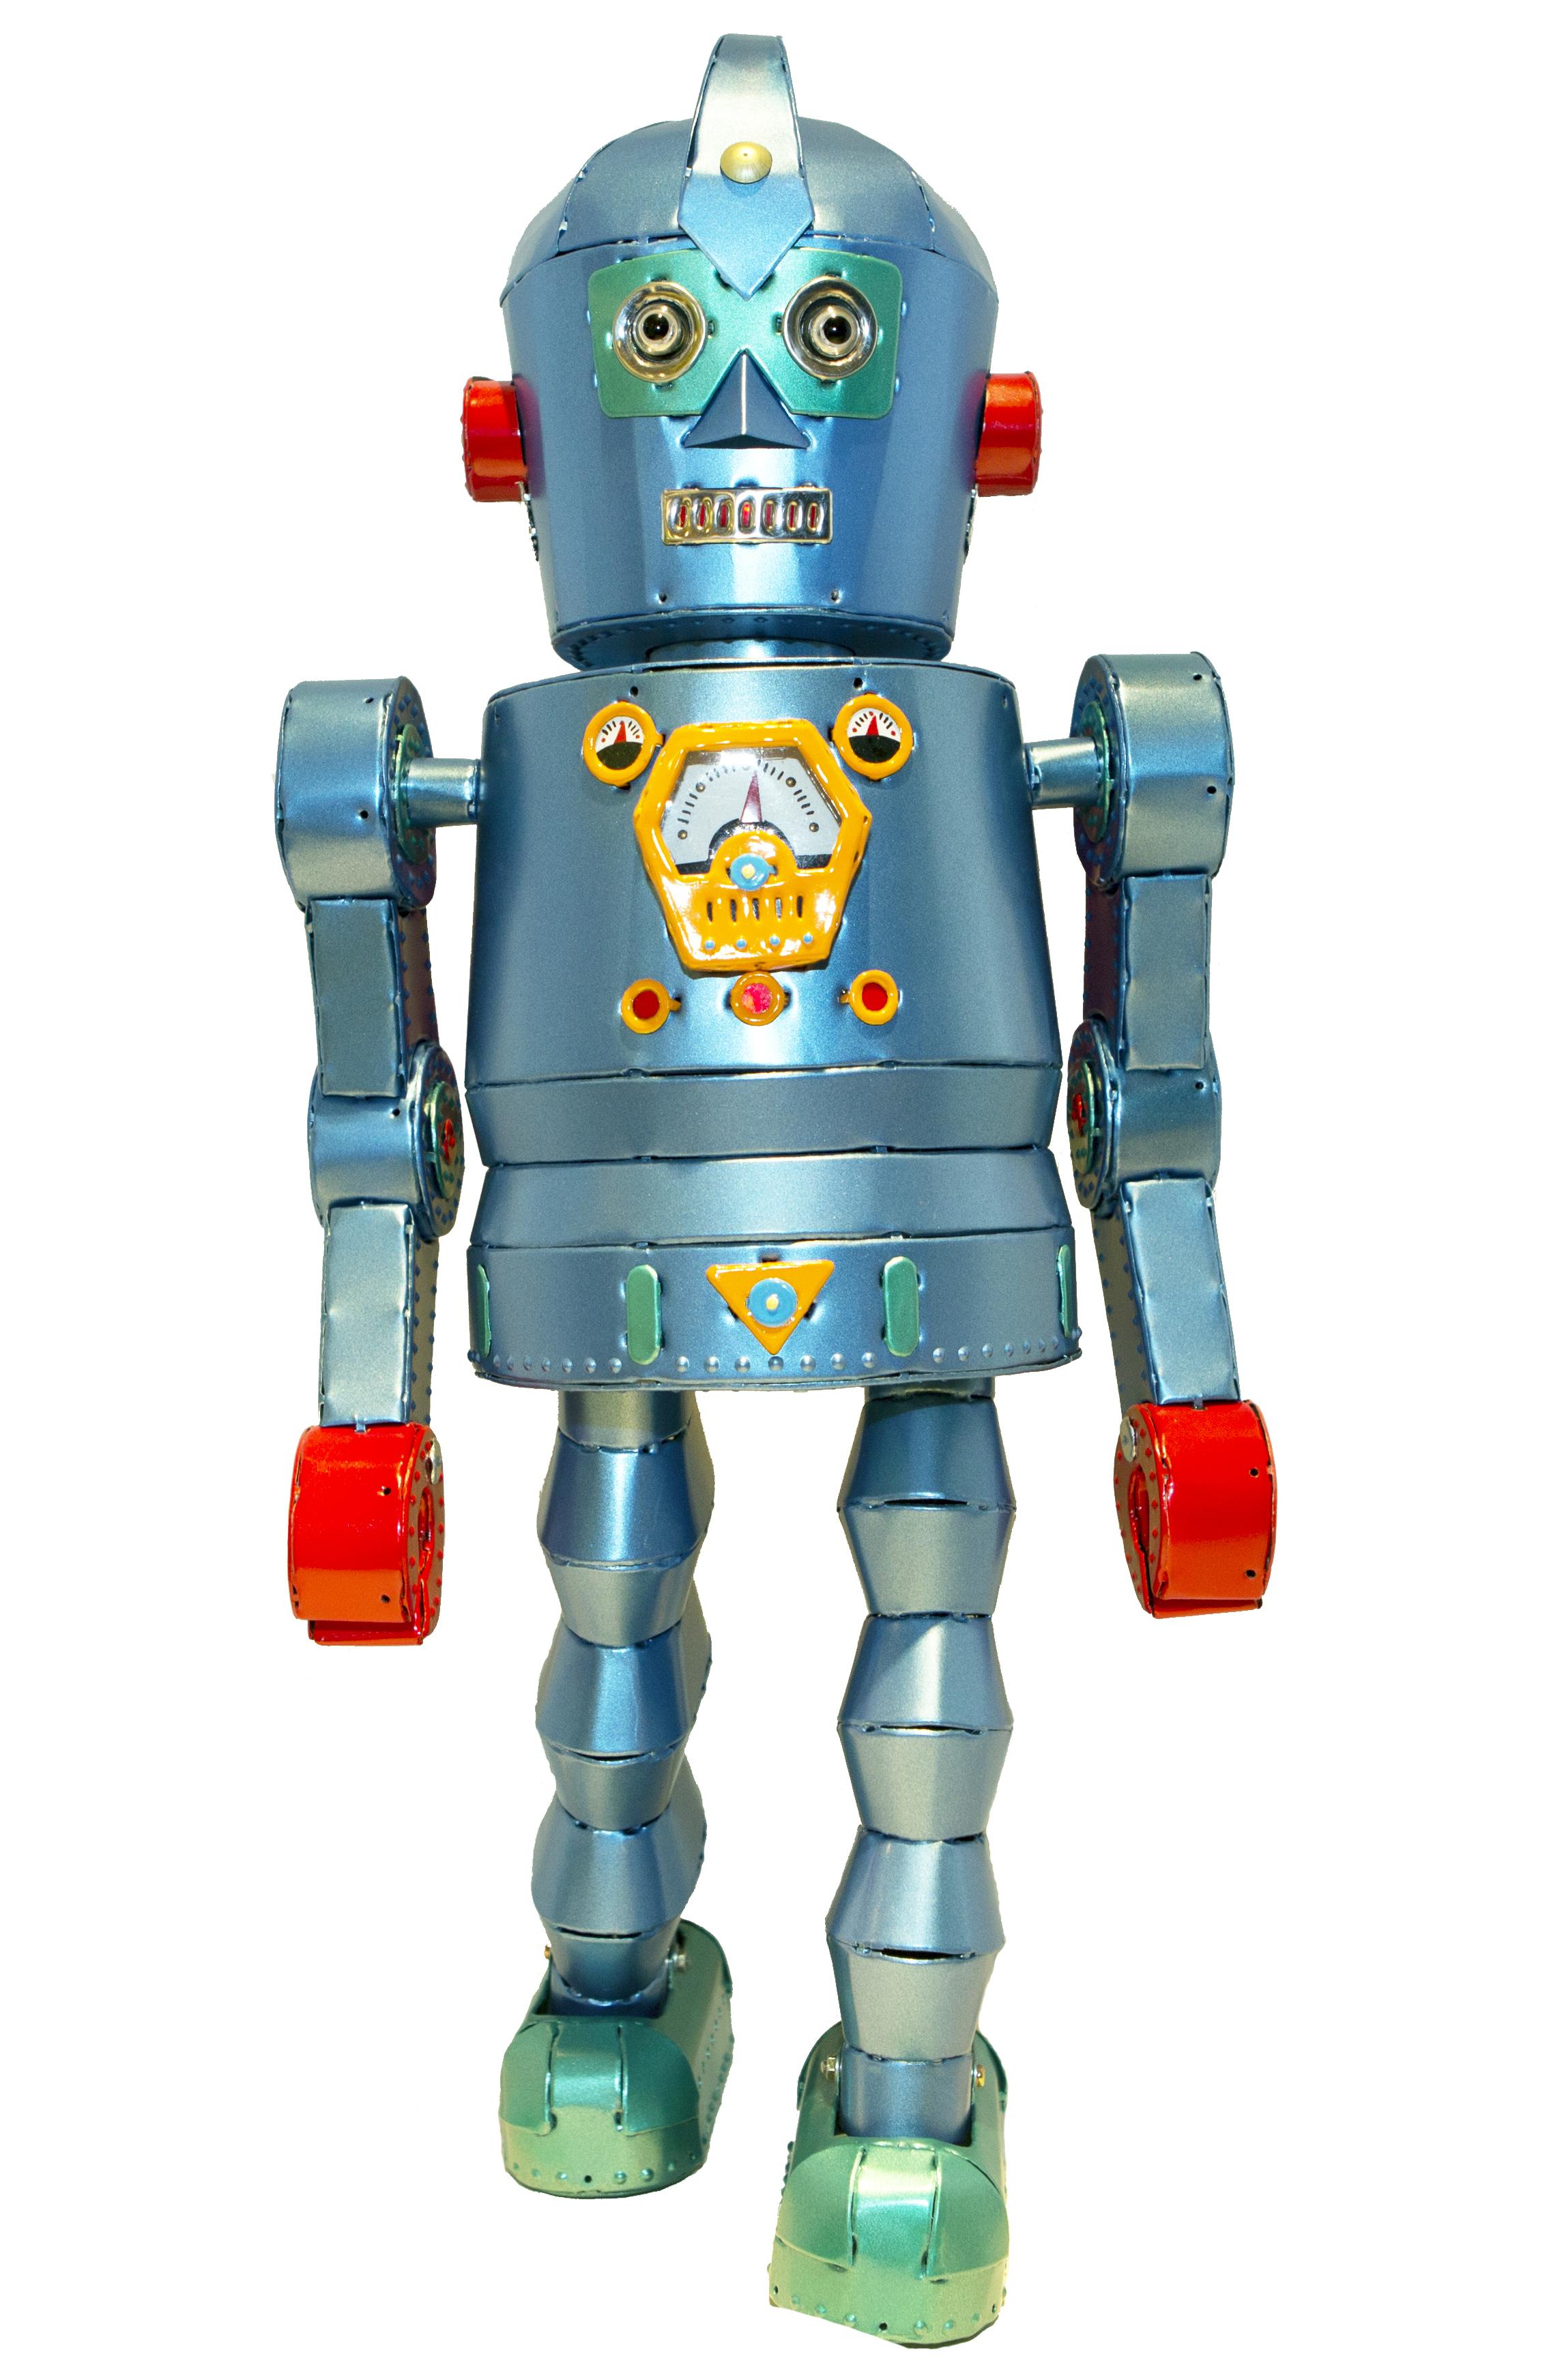 KID ART ROBOT